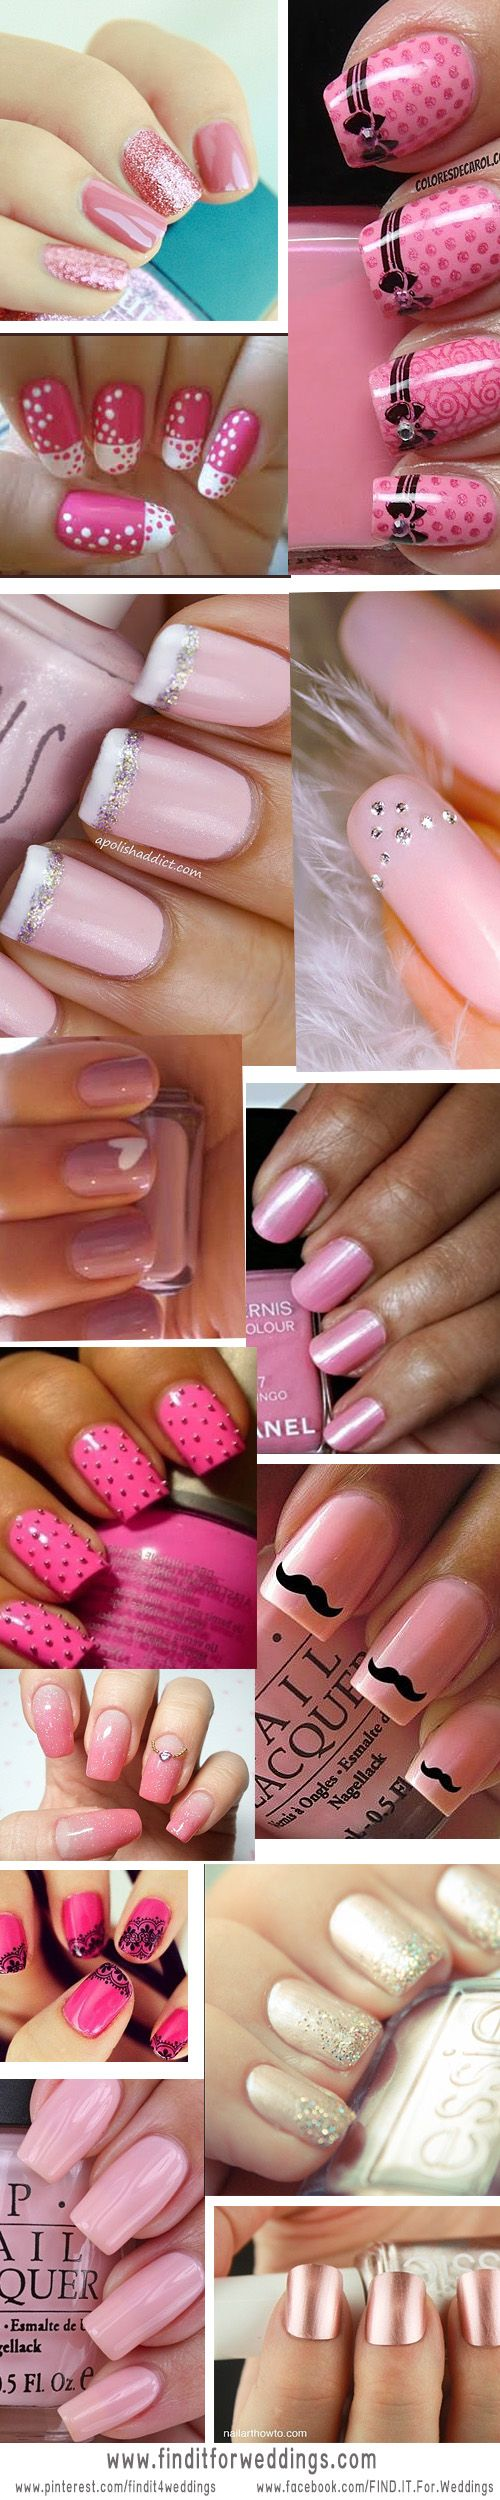 Nail Art Designs in pink